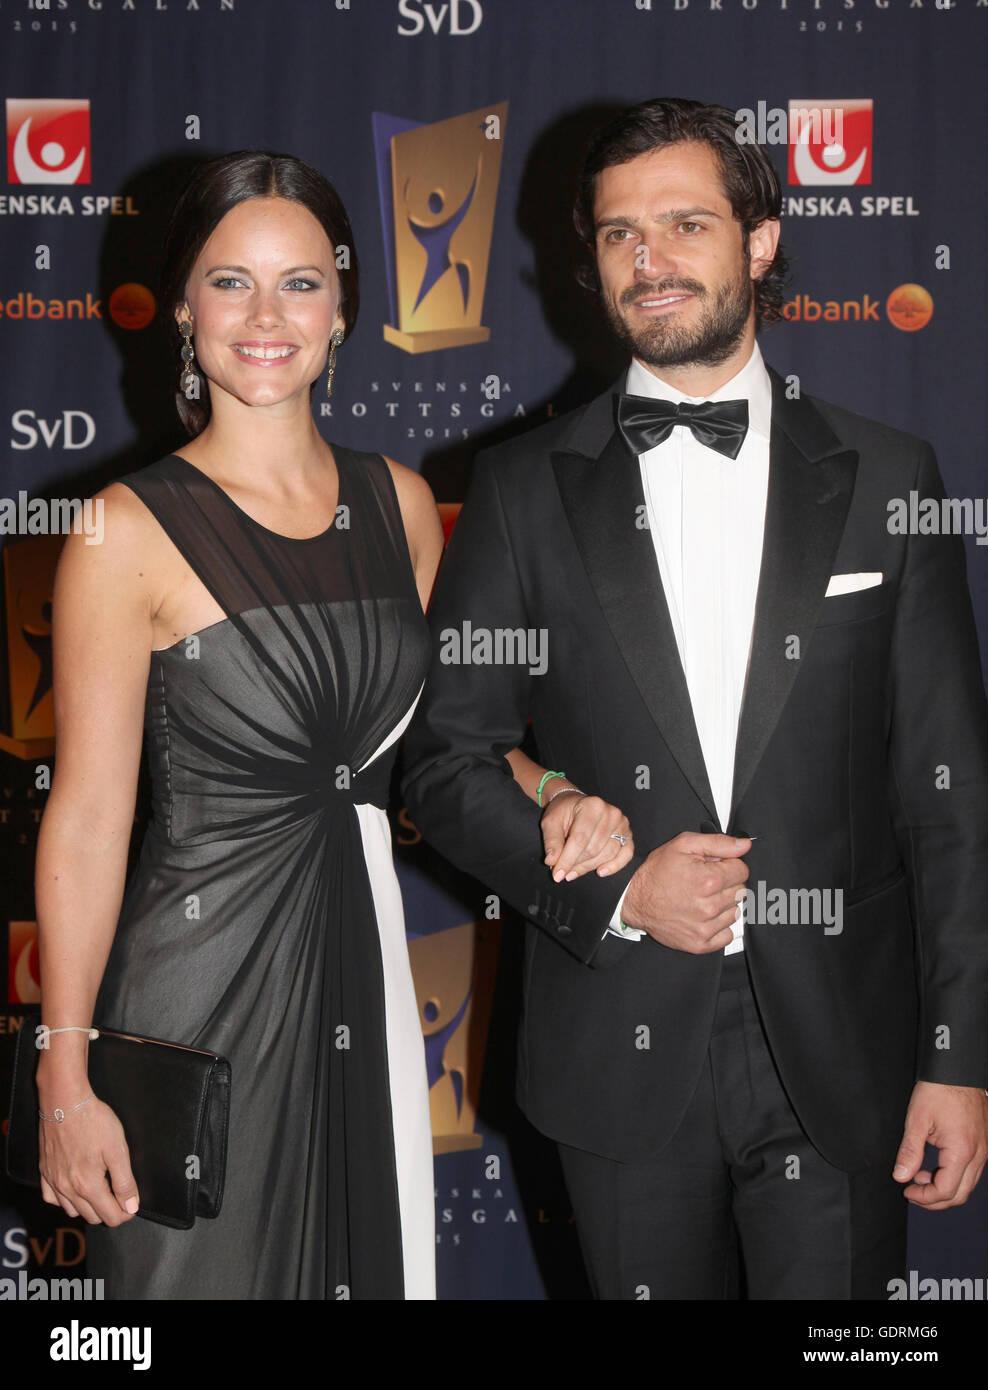 The Swedish Prince  CARL PHILIP with his future wife Sofia Hellqvist at Swedish sport gala - Stock Image